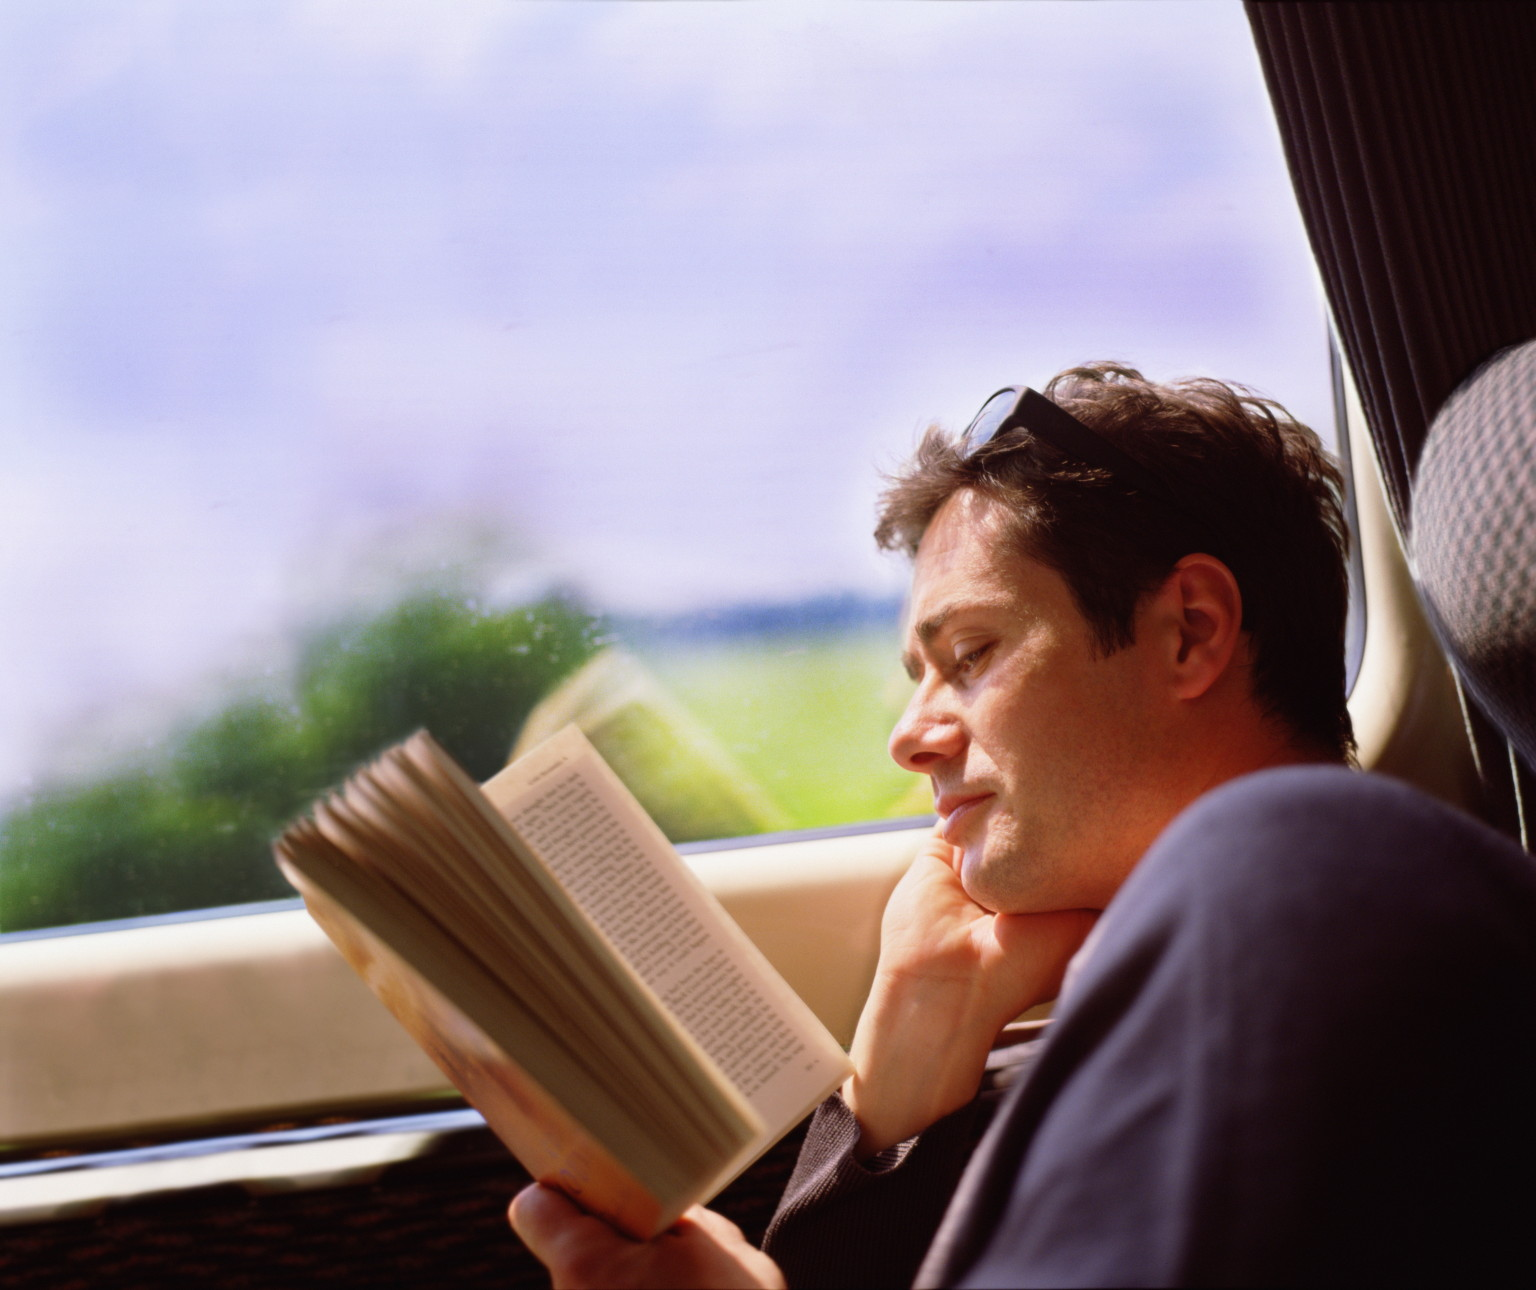 Oreadingabookfacebook